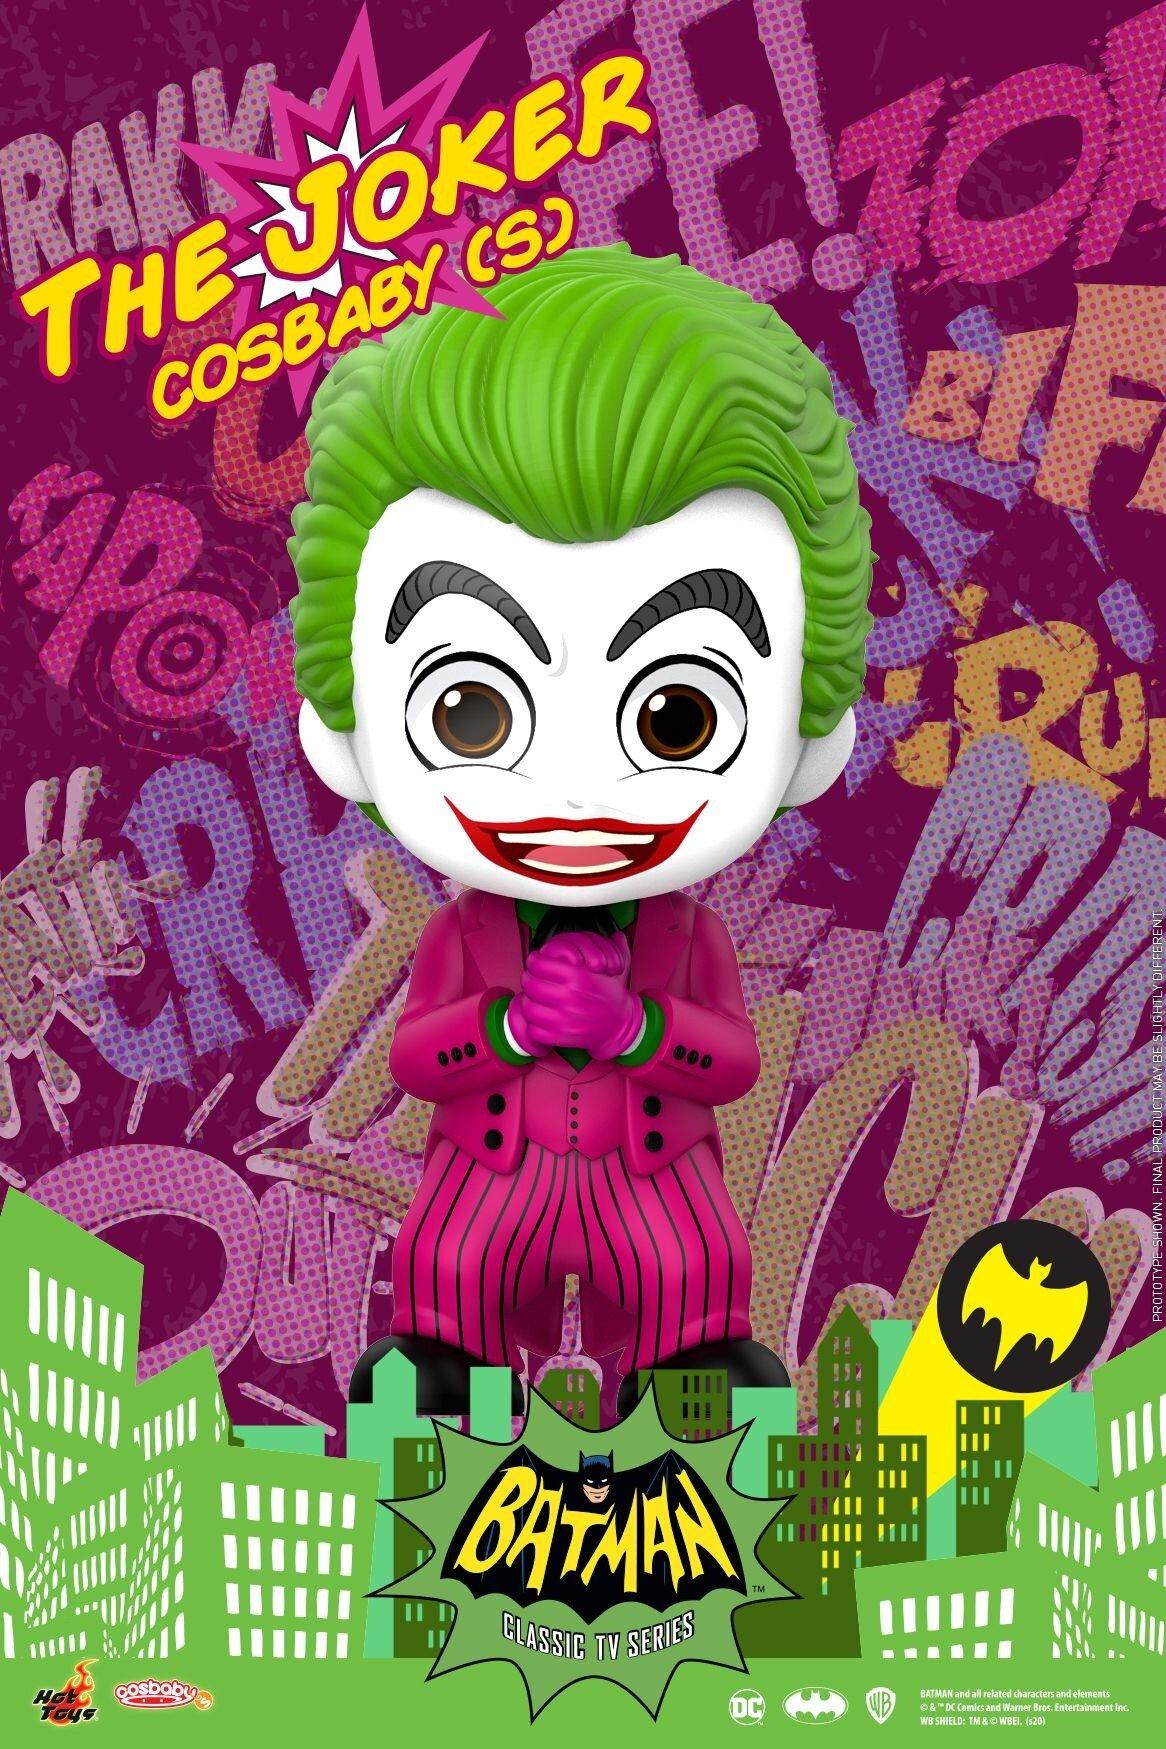 [Hot Toys] 코스베이비 배트맨 클래식 TV : 조커 COSB708